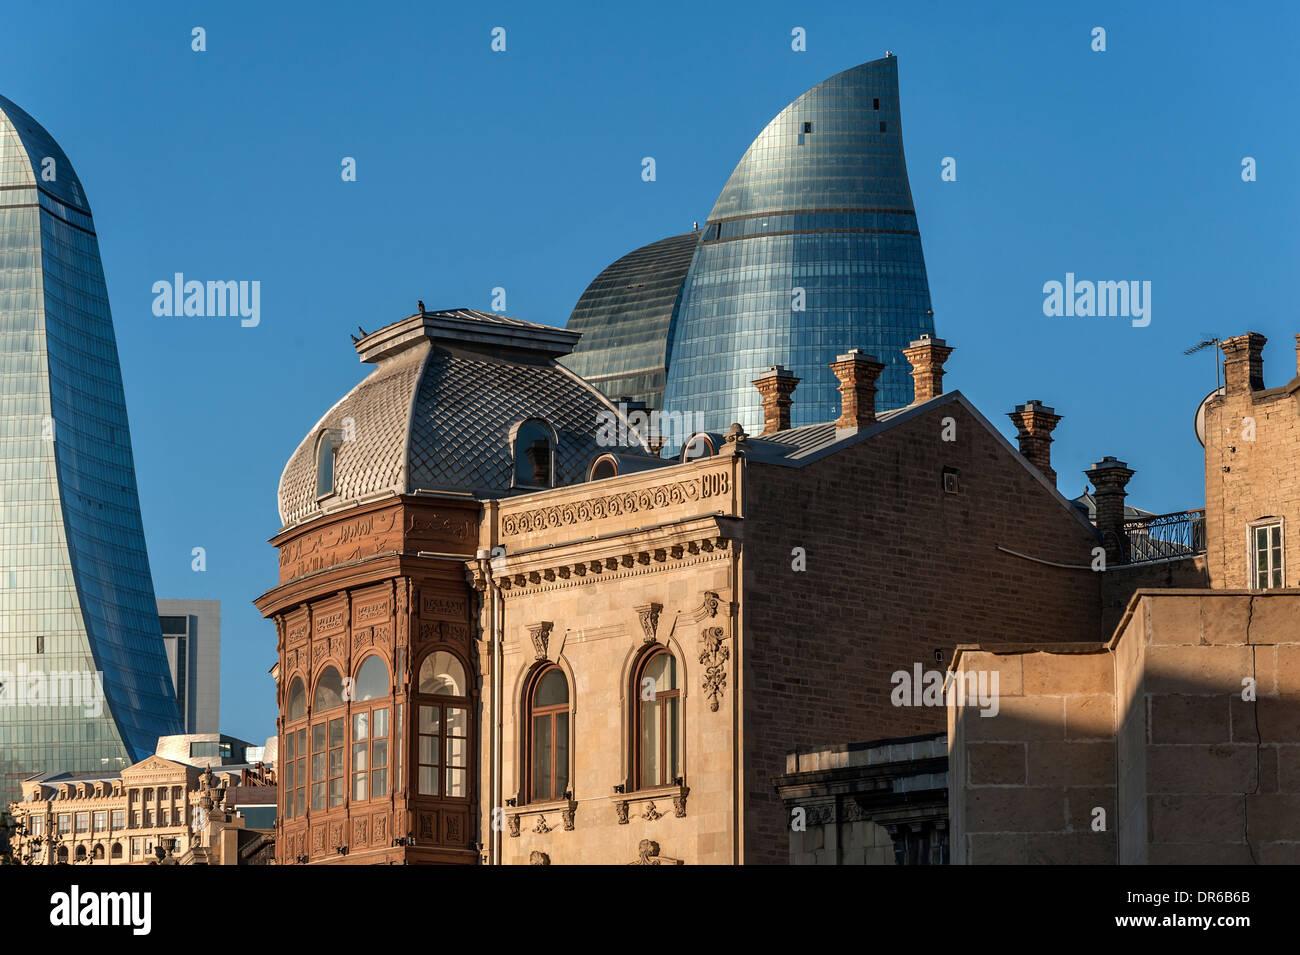 City scene old and modern architecture Baku Azerbaijan - Stock Image